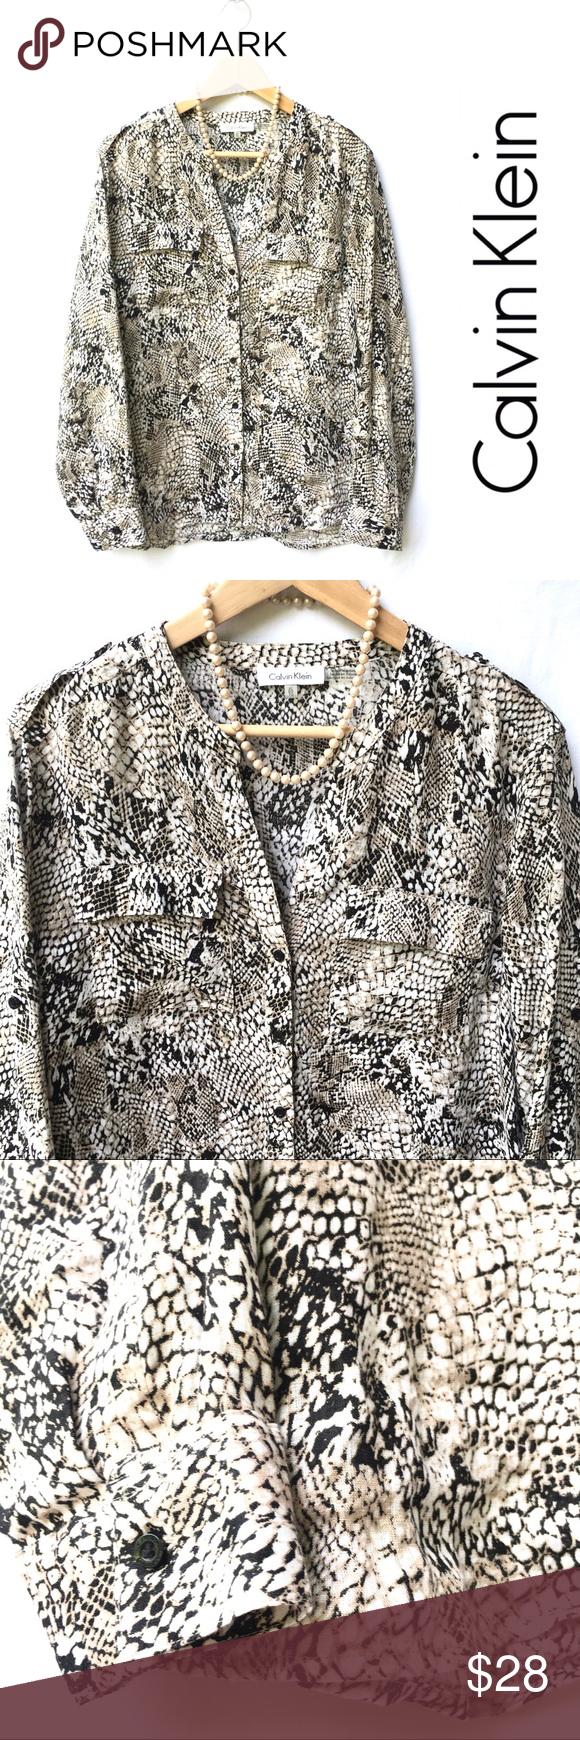 Calvin Klein Linen Blouse Fashion Clothes Design Linen Blouse